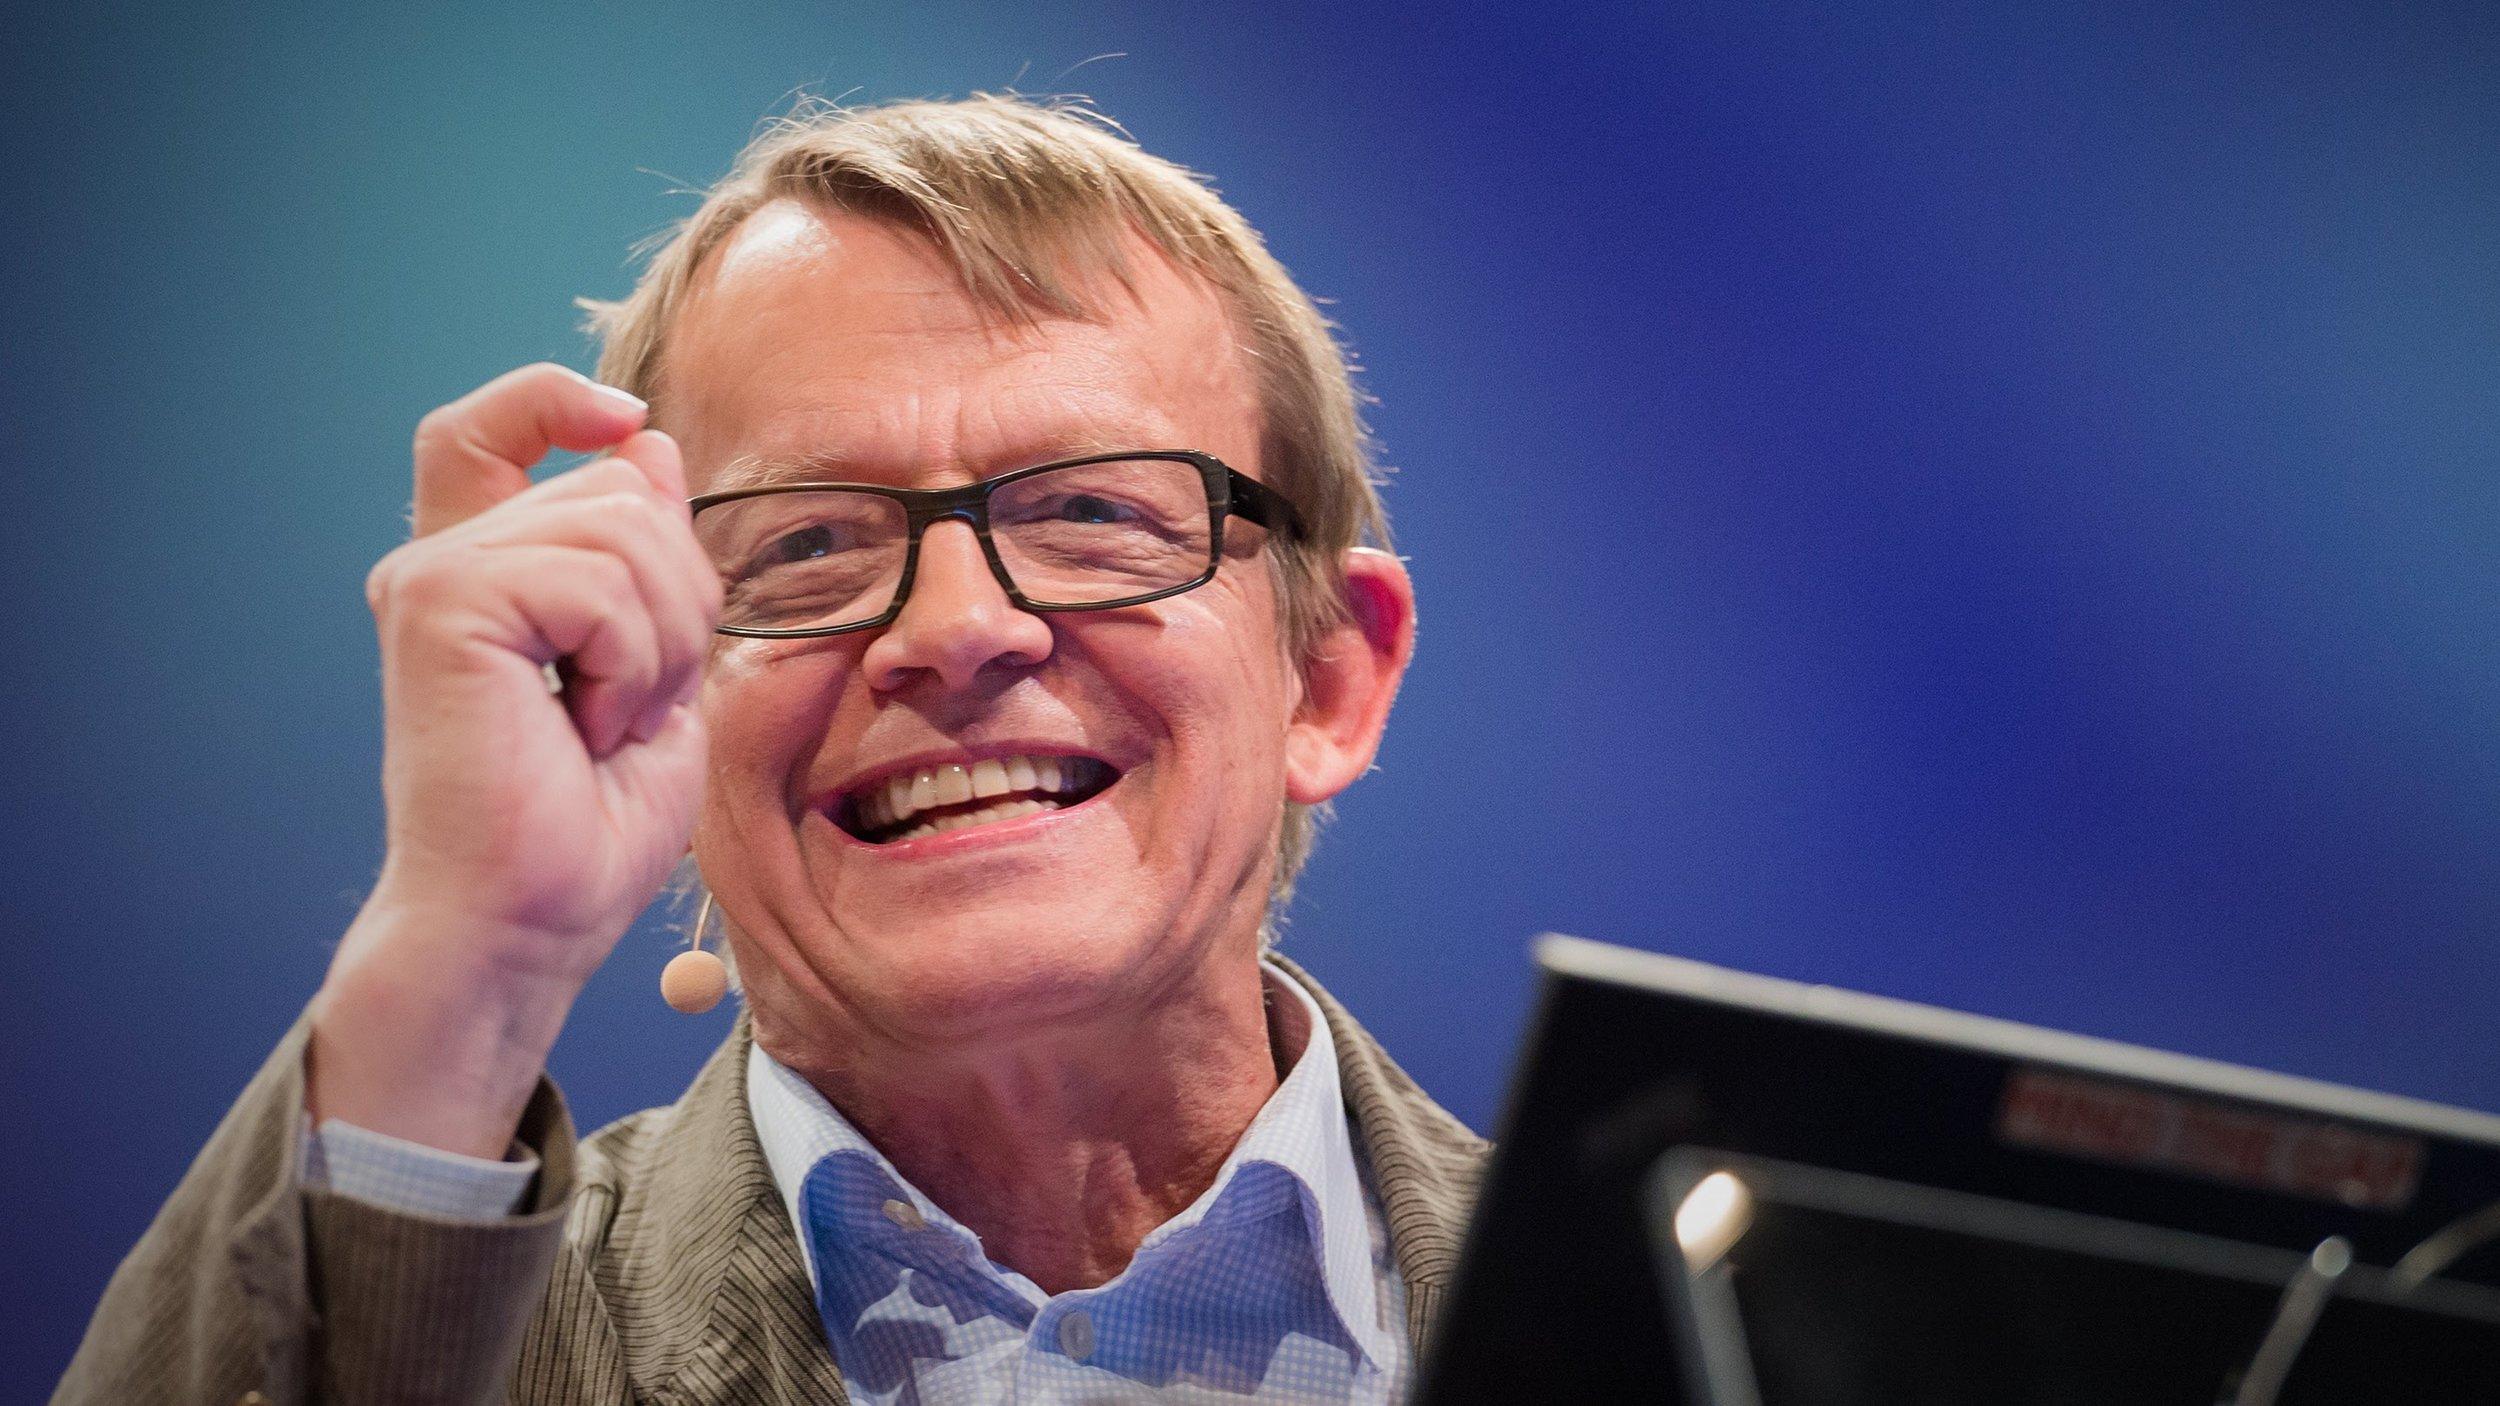 BBC/Hans Rosling